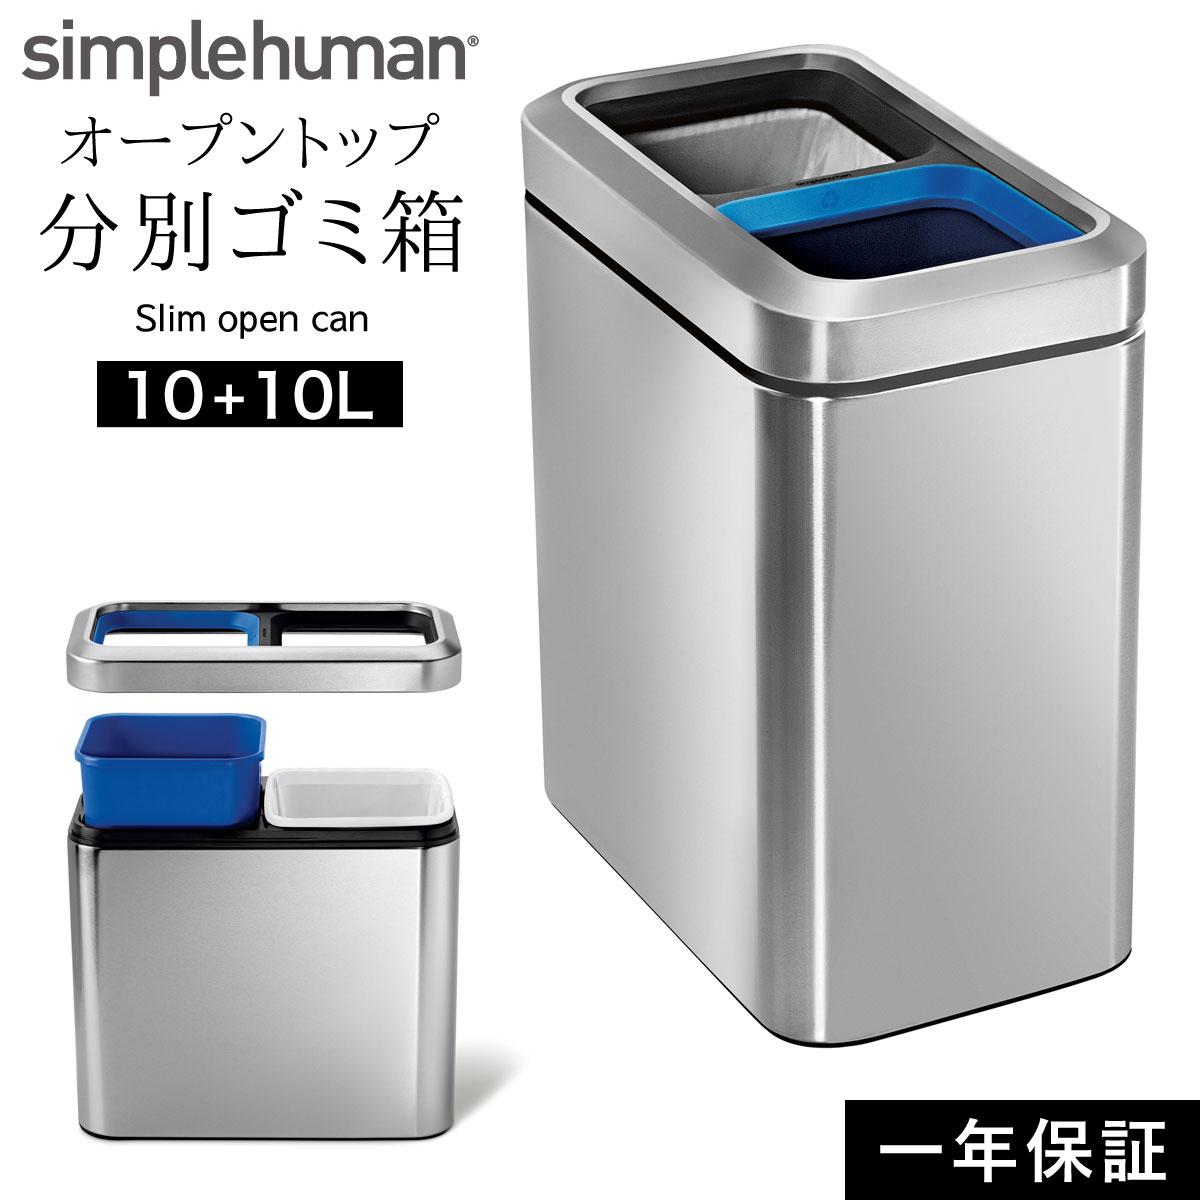 simplehuman シンプルヒューマン ゴミ箱 ごみ箱 分別 スリムオープンカン 20L 00143